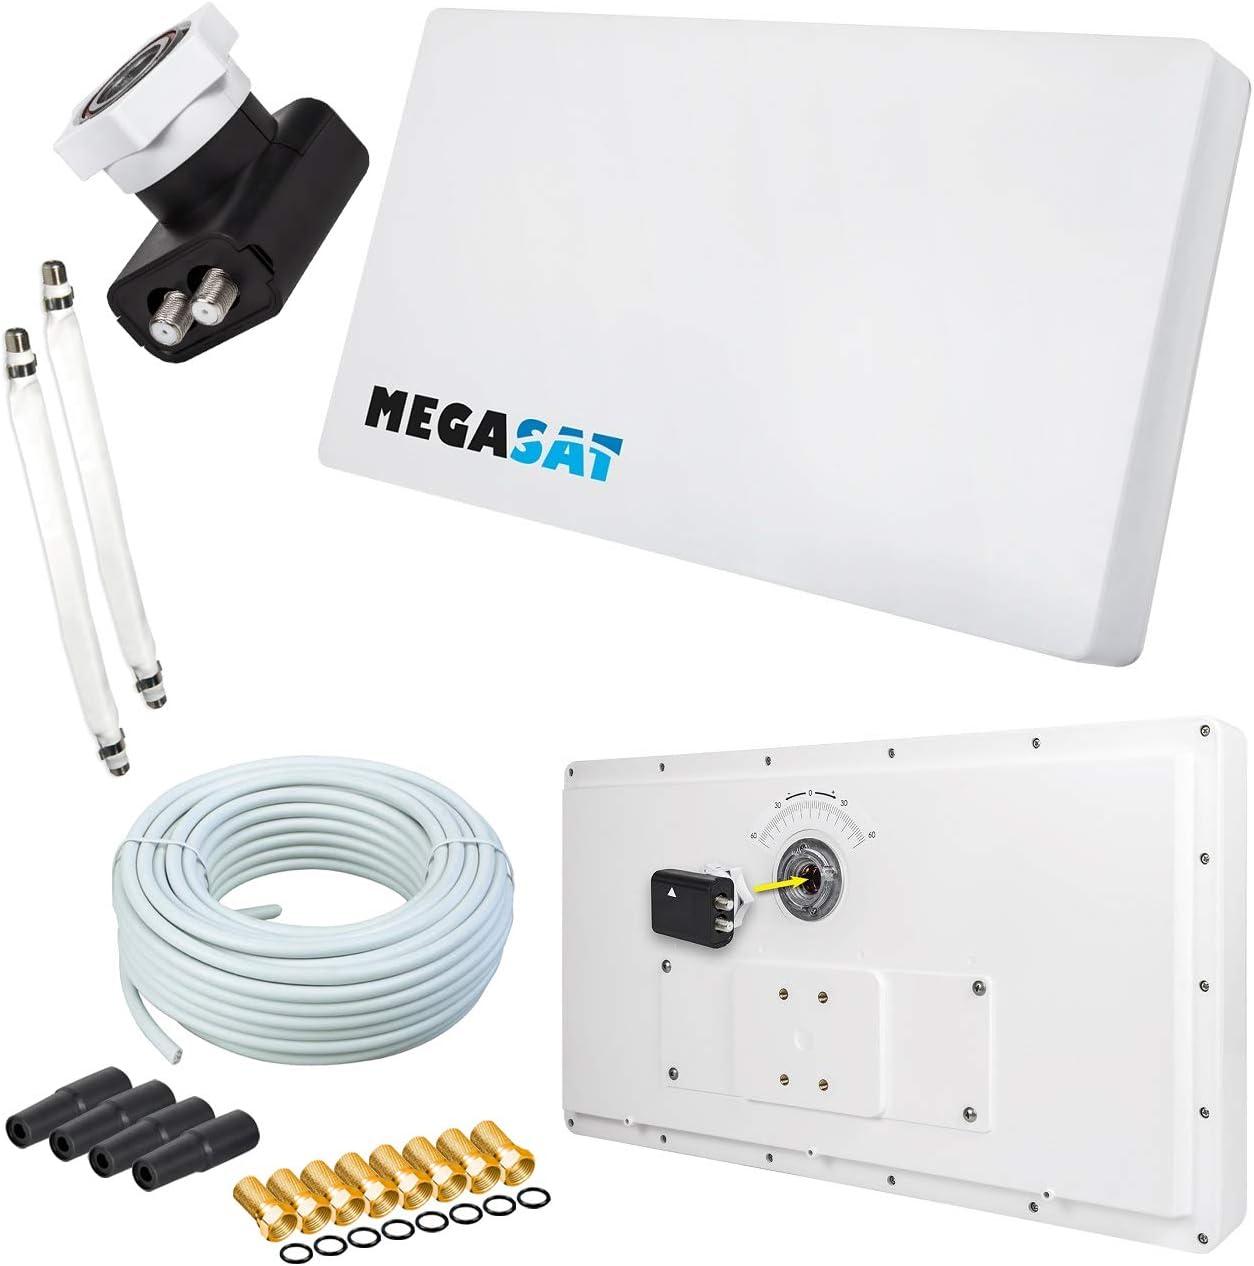 Antena plana Micro Sat Single + 10 m Cable + 1 Ventana durchführungen + 4 conectores F